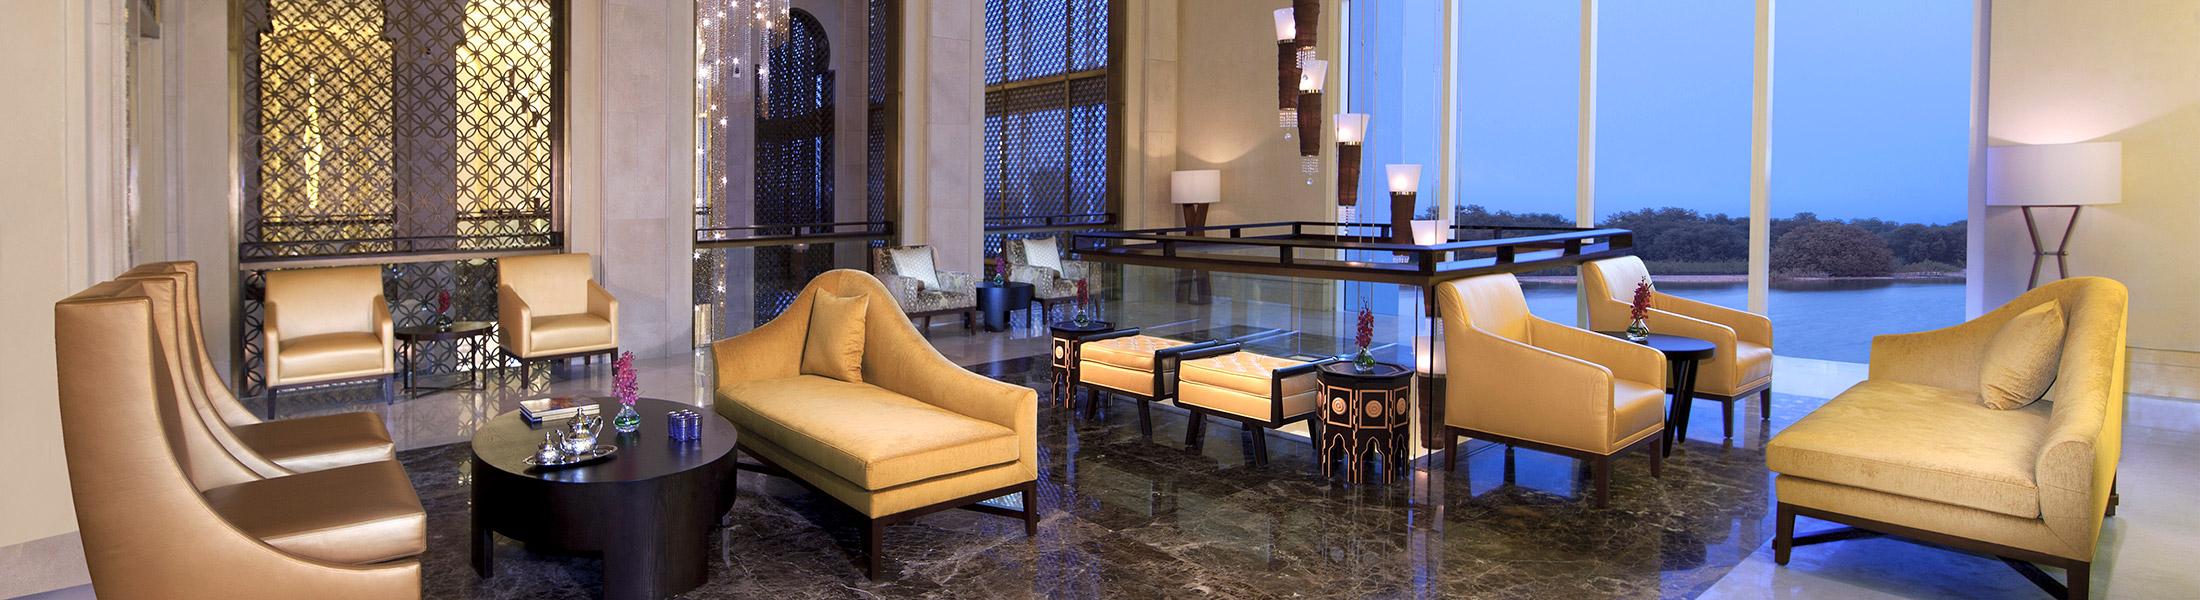 Lobby Lounge of the Anantara Eastern Mangroves